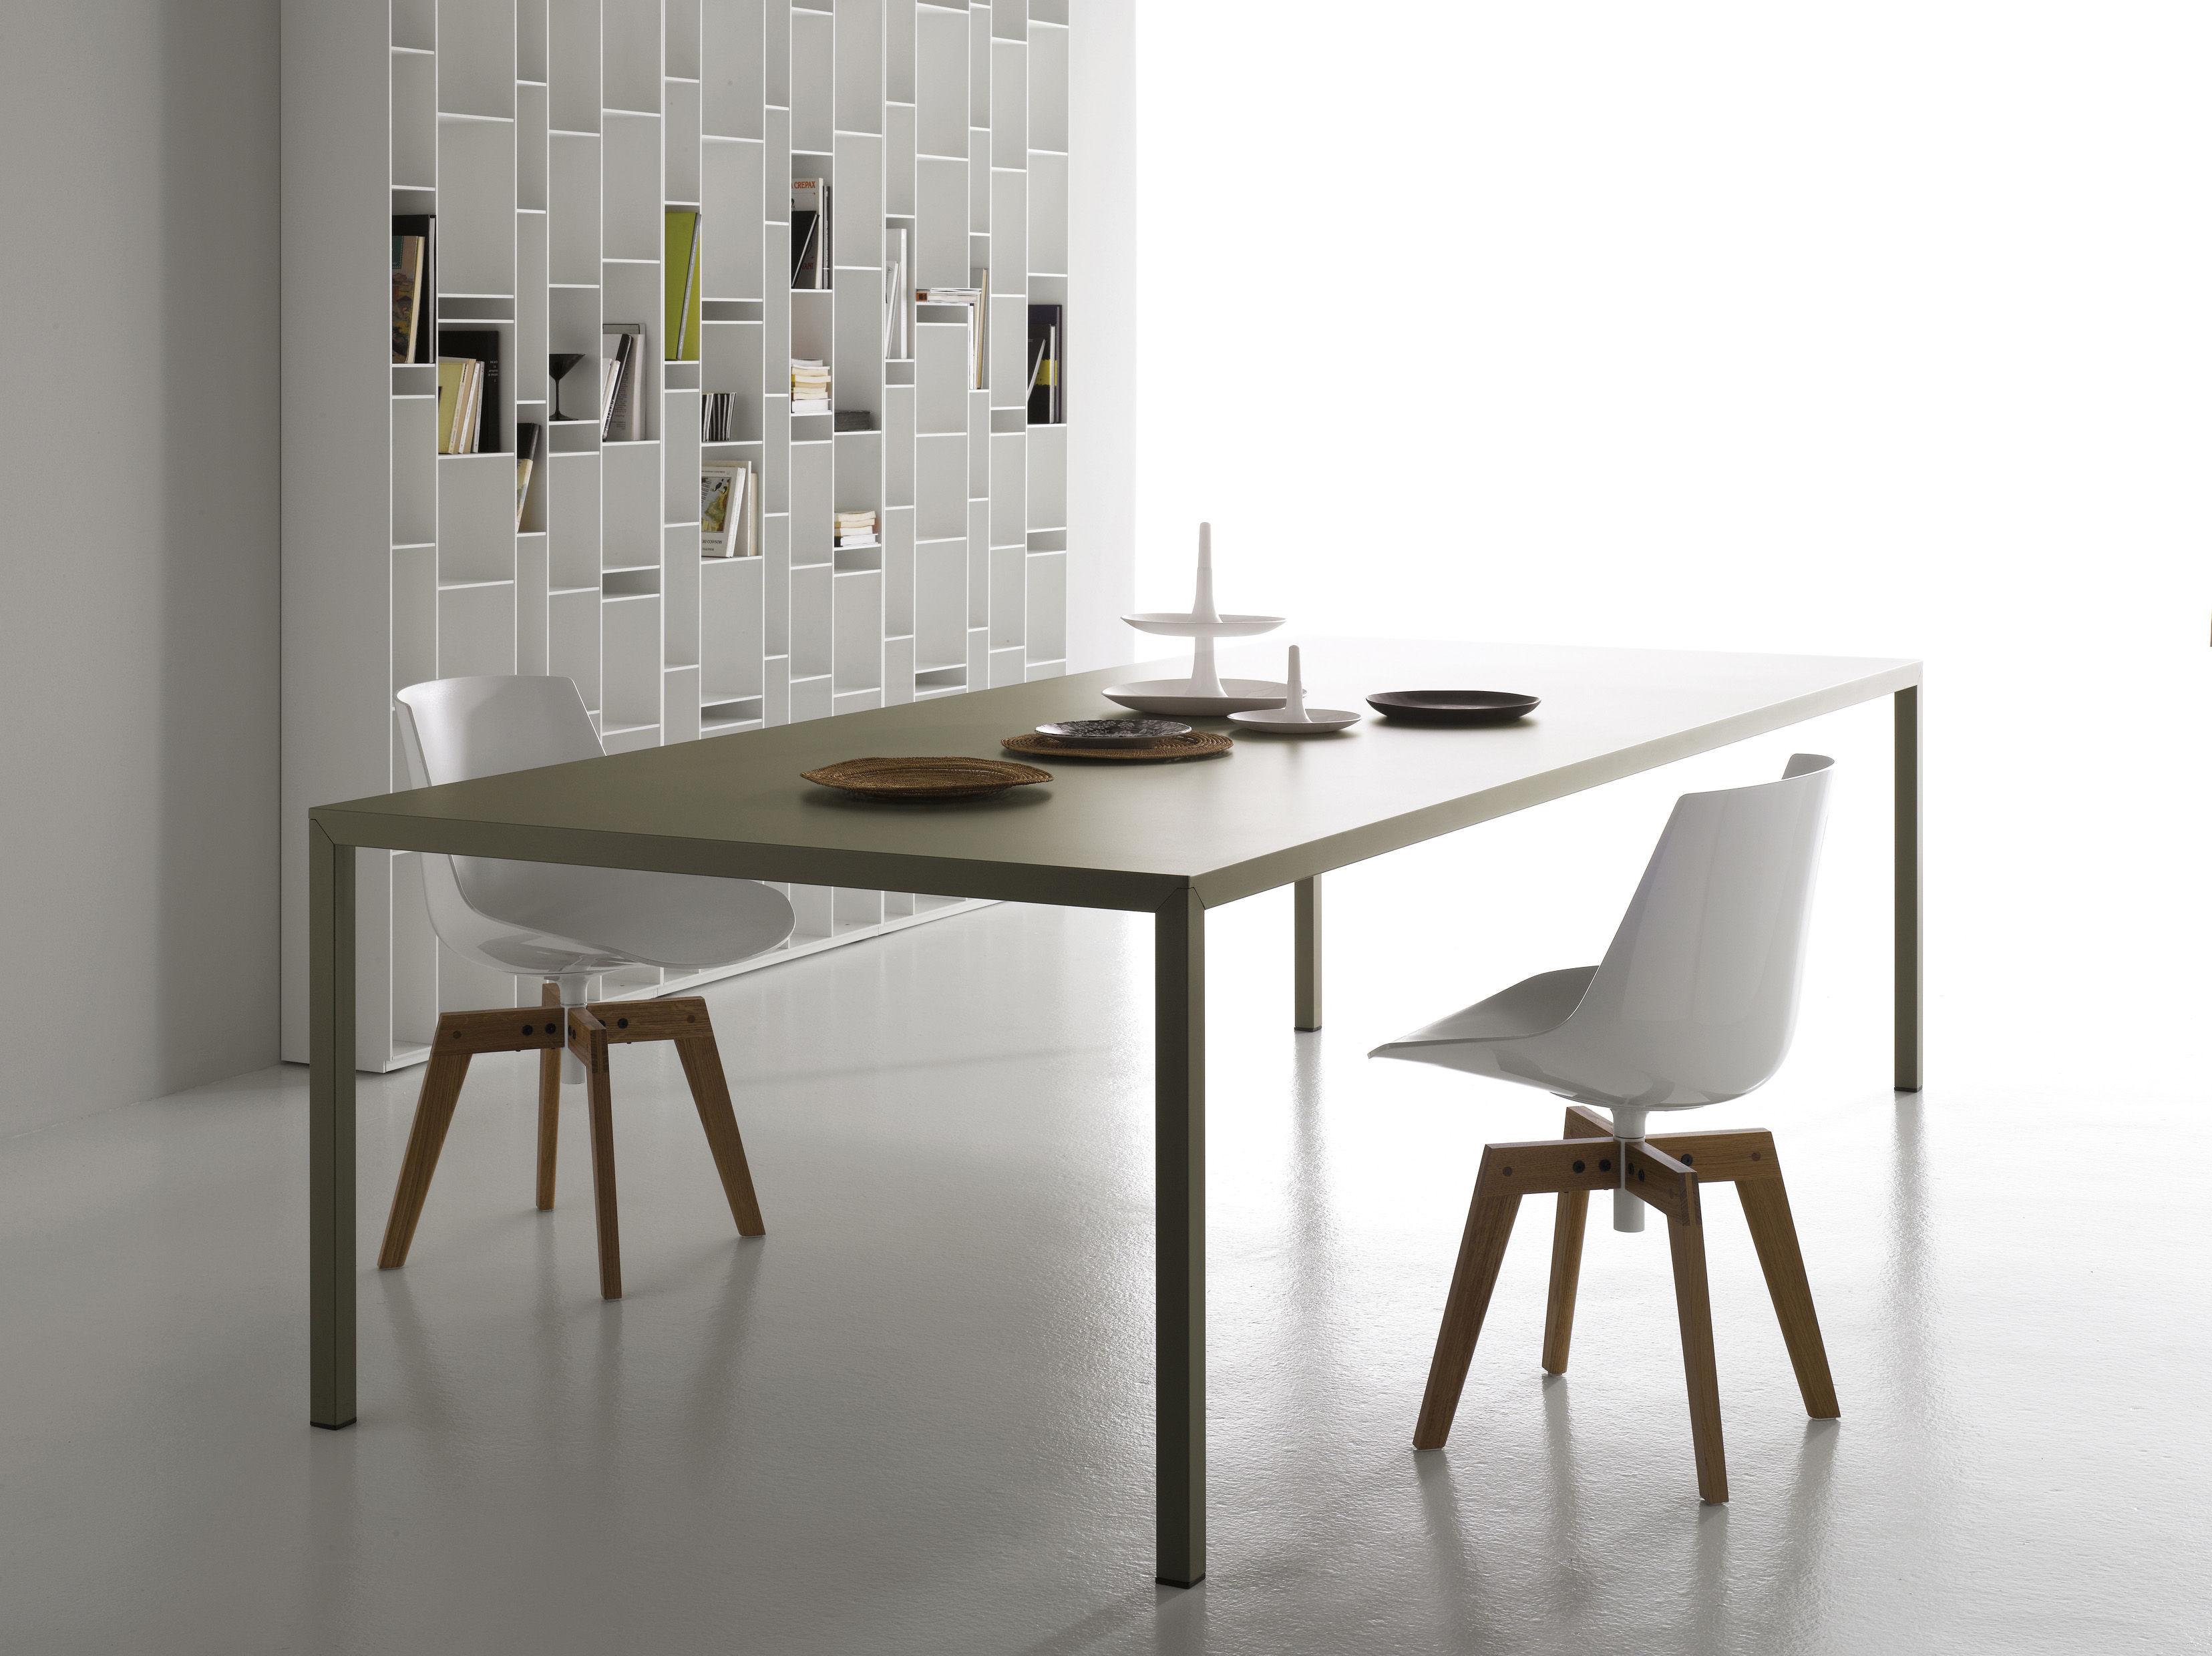 Table steel 100 x 240 cm 100 x 240 cm noir manganèse mdf